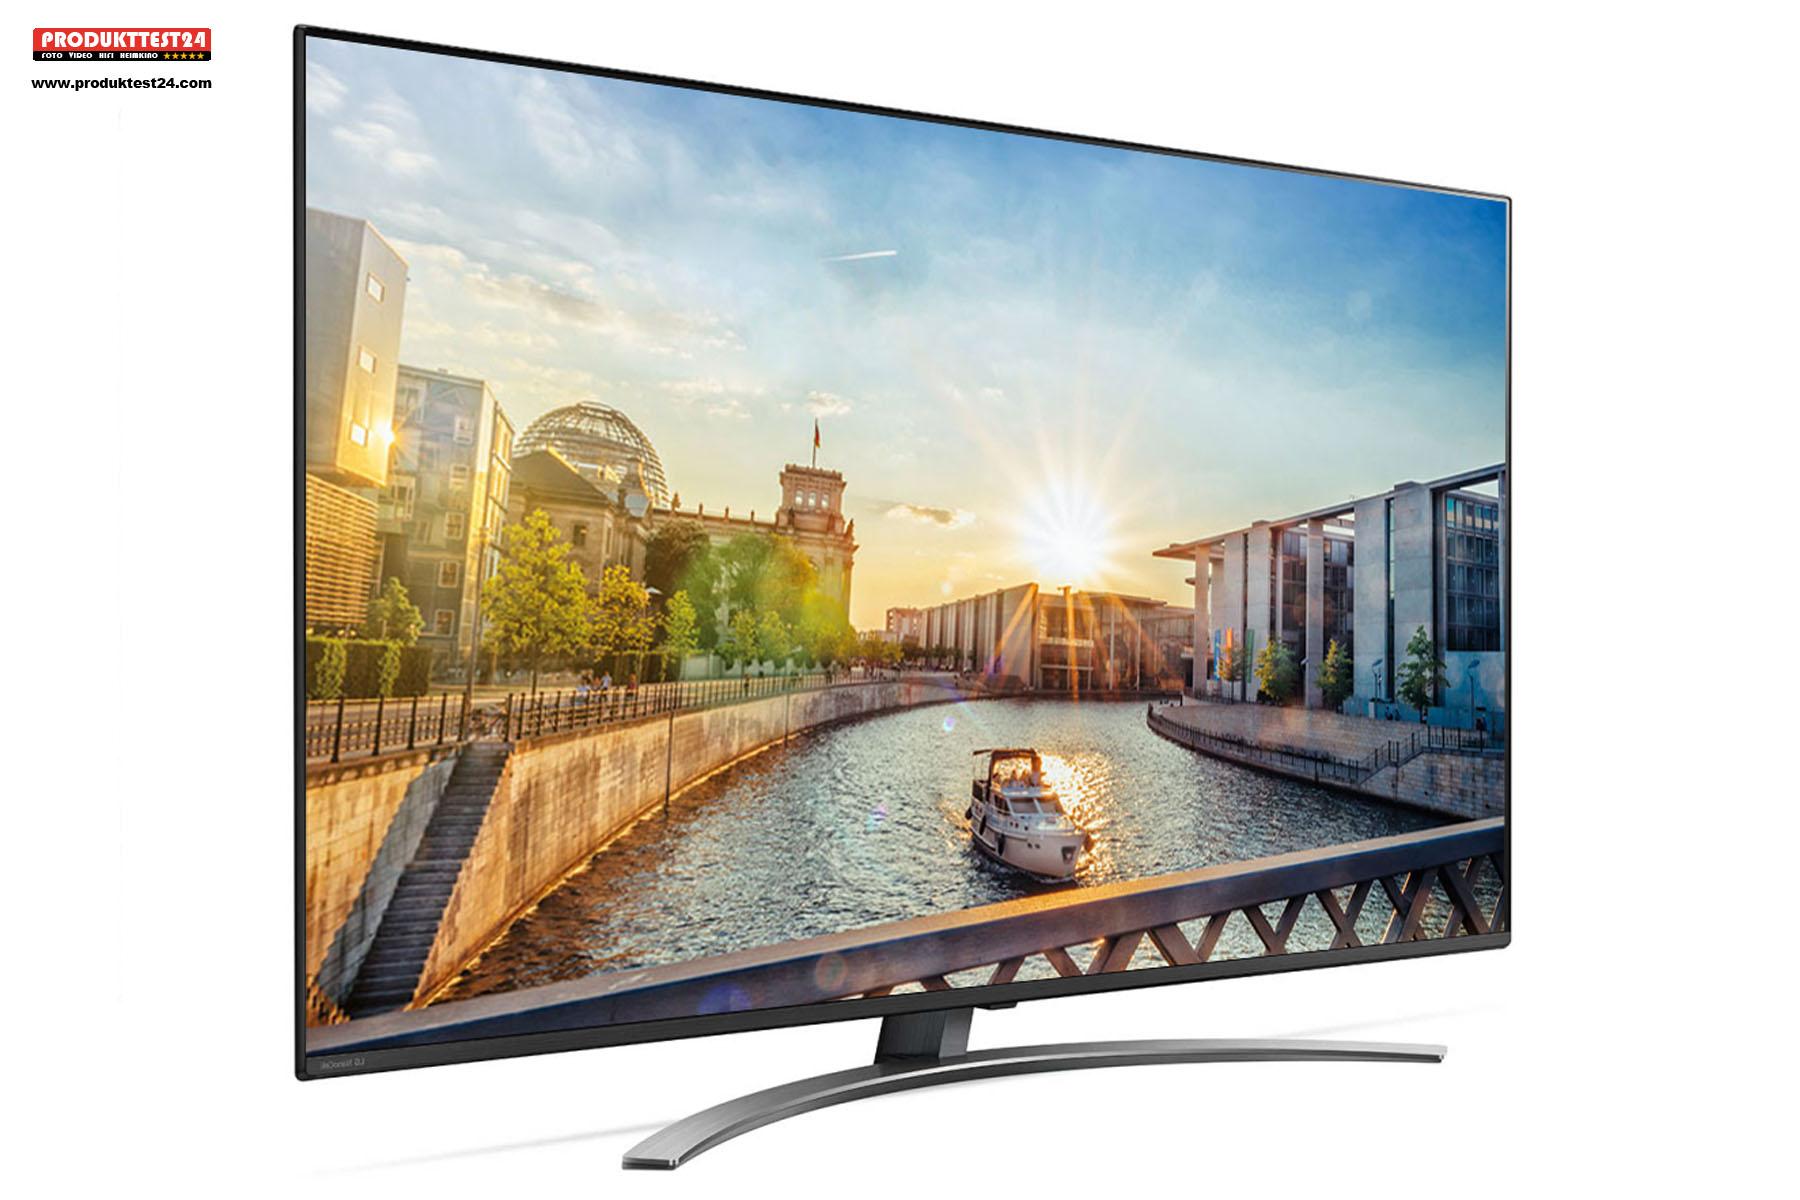 LG 49SM8200 Ultra HD Fernseher mit Nanozellen